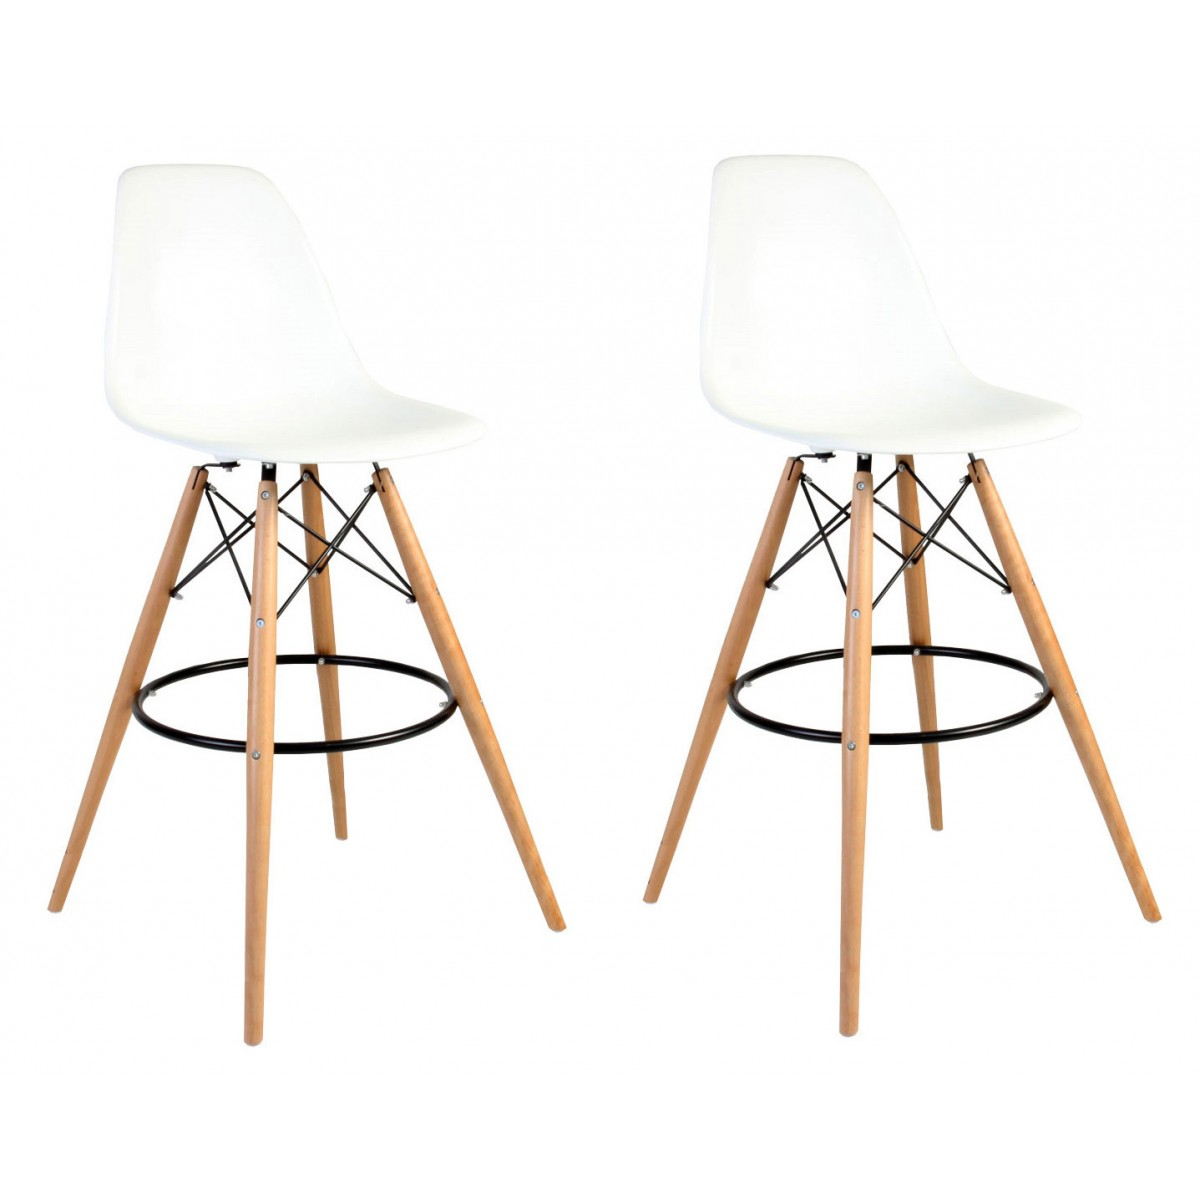 Set of 2 Eames Style DSW White Plastic 30 Inch Bar Stool  : eames stools white beech leg 752p1 from www.emoderndecor.com size 1200 x 1200 jpeg 92kB